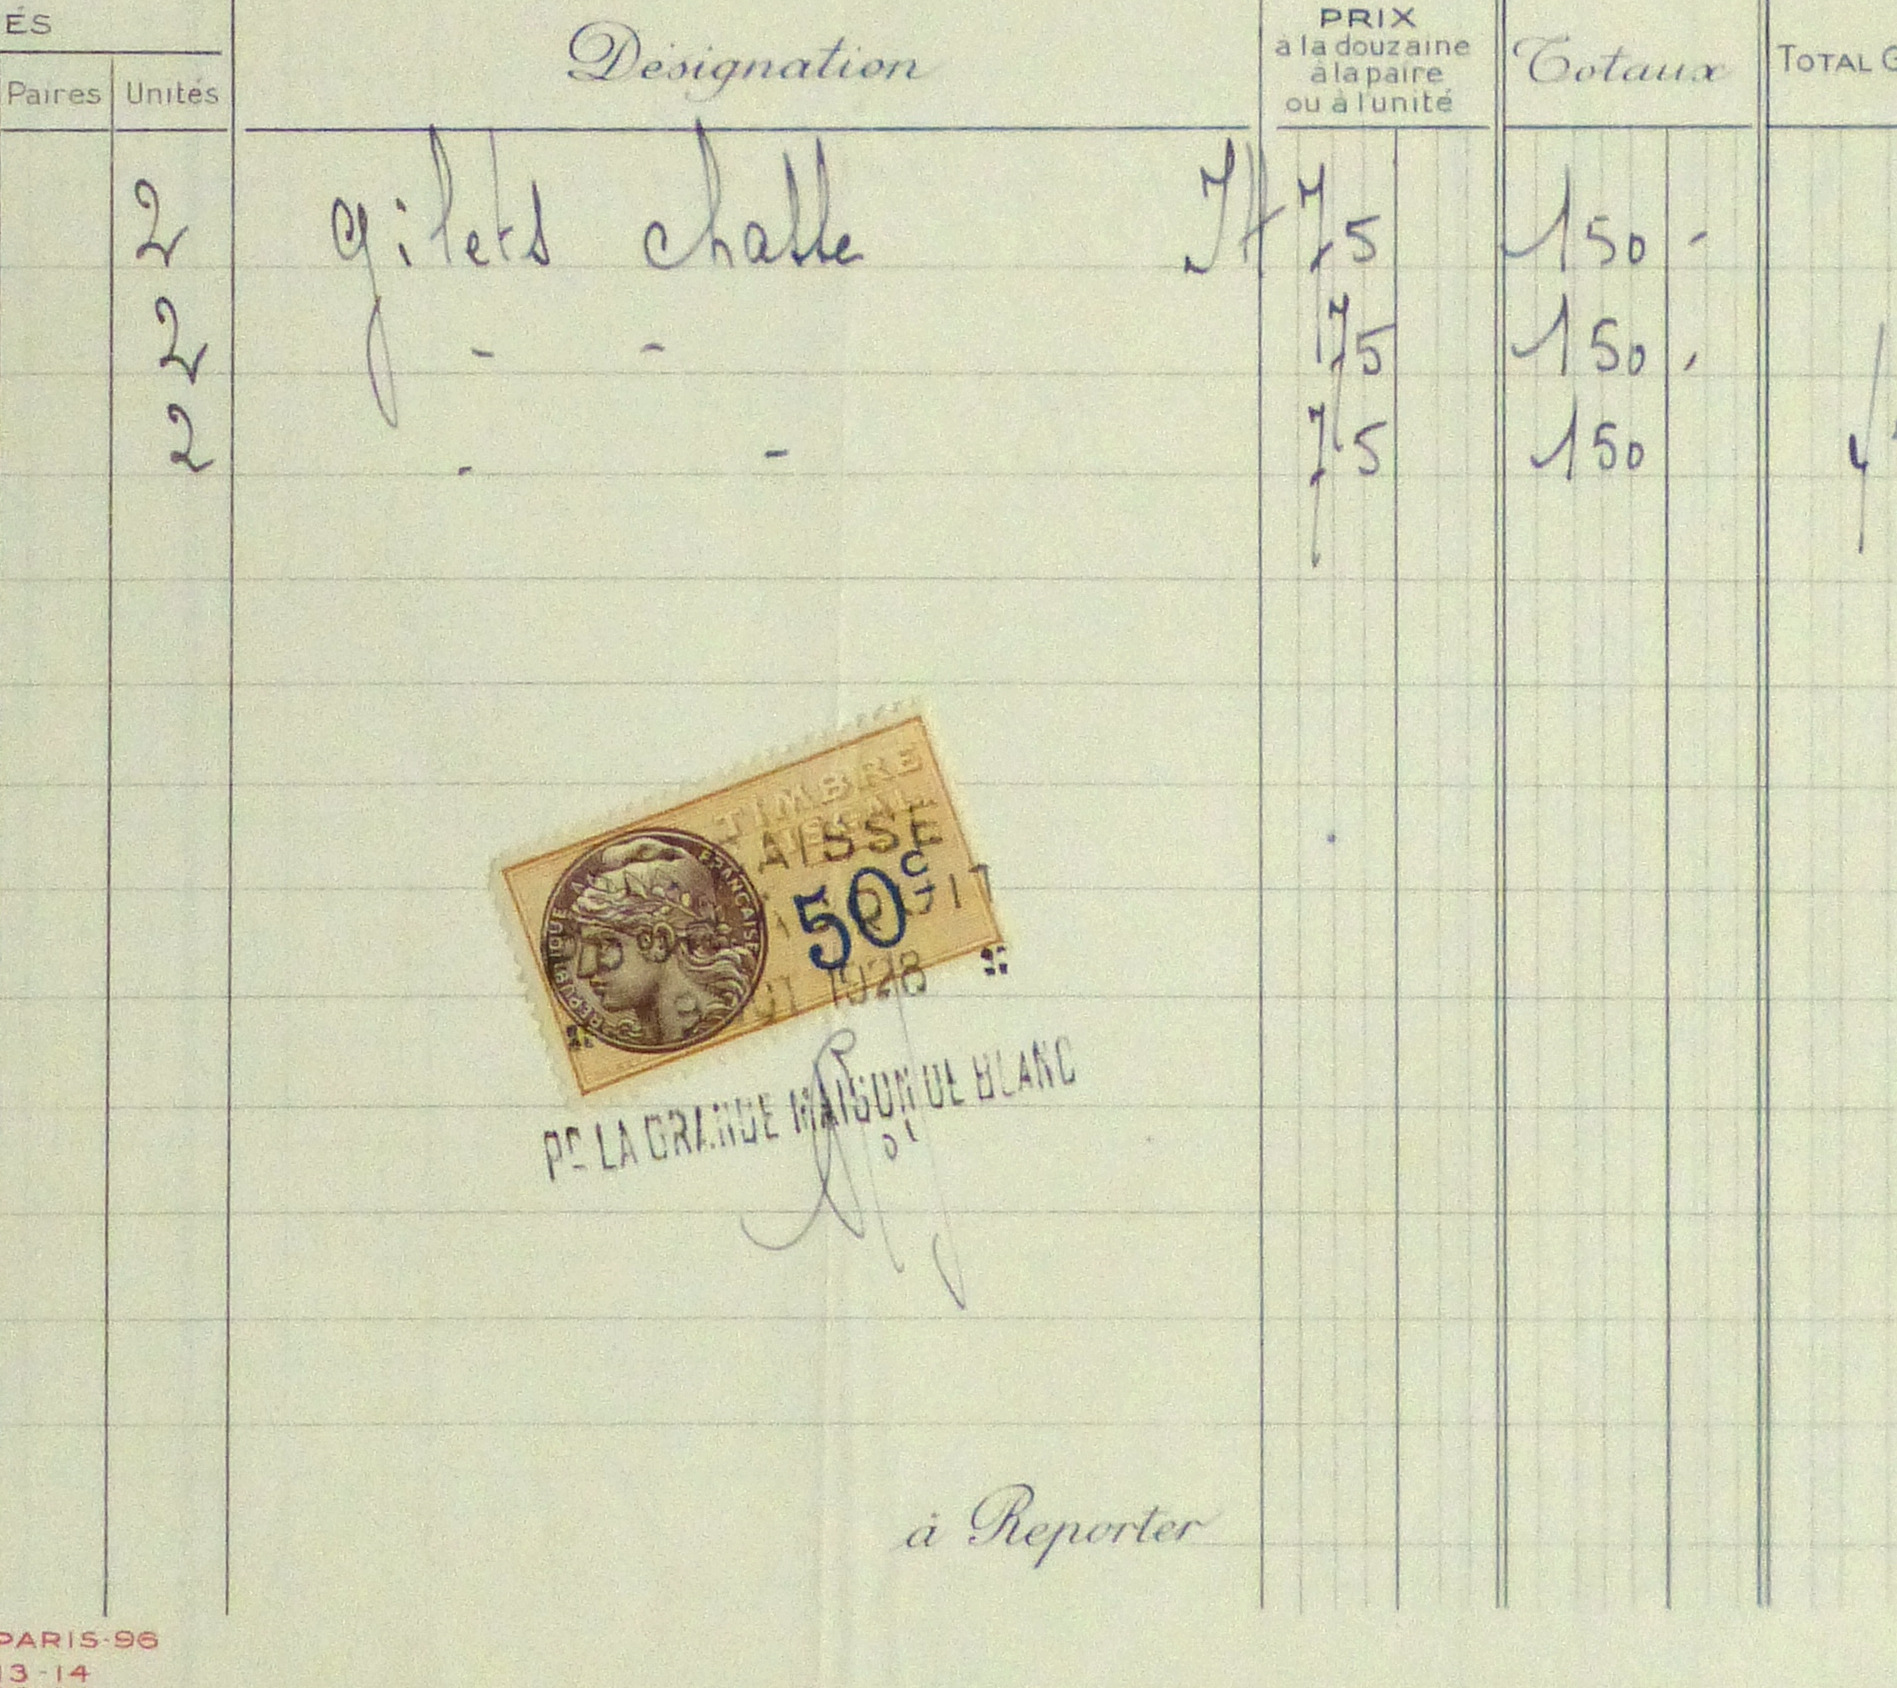 Duchess of Maillé Fine Linens Receipt, 1928-detail-10556M